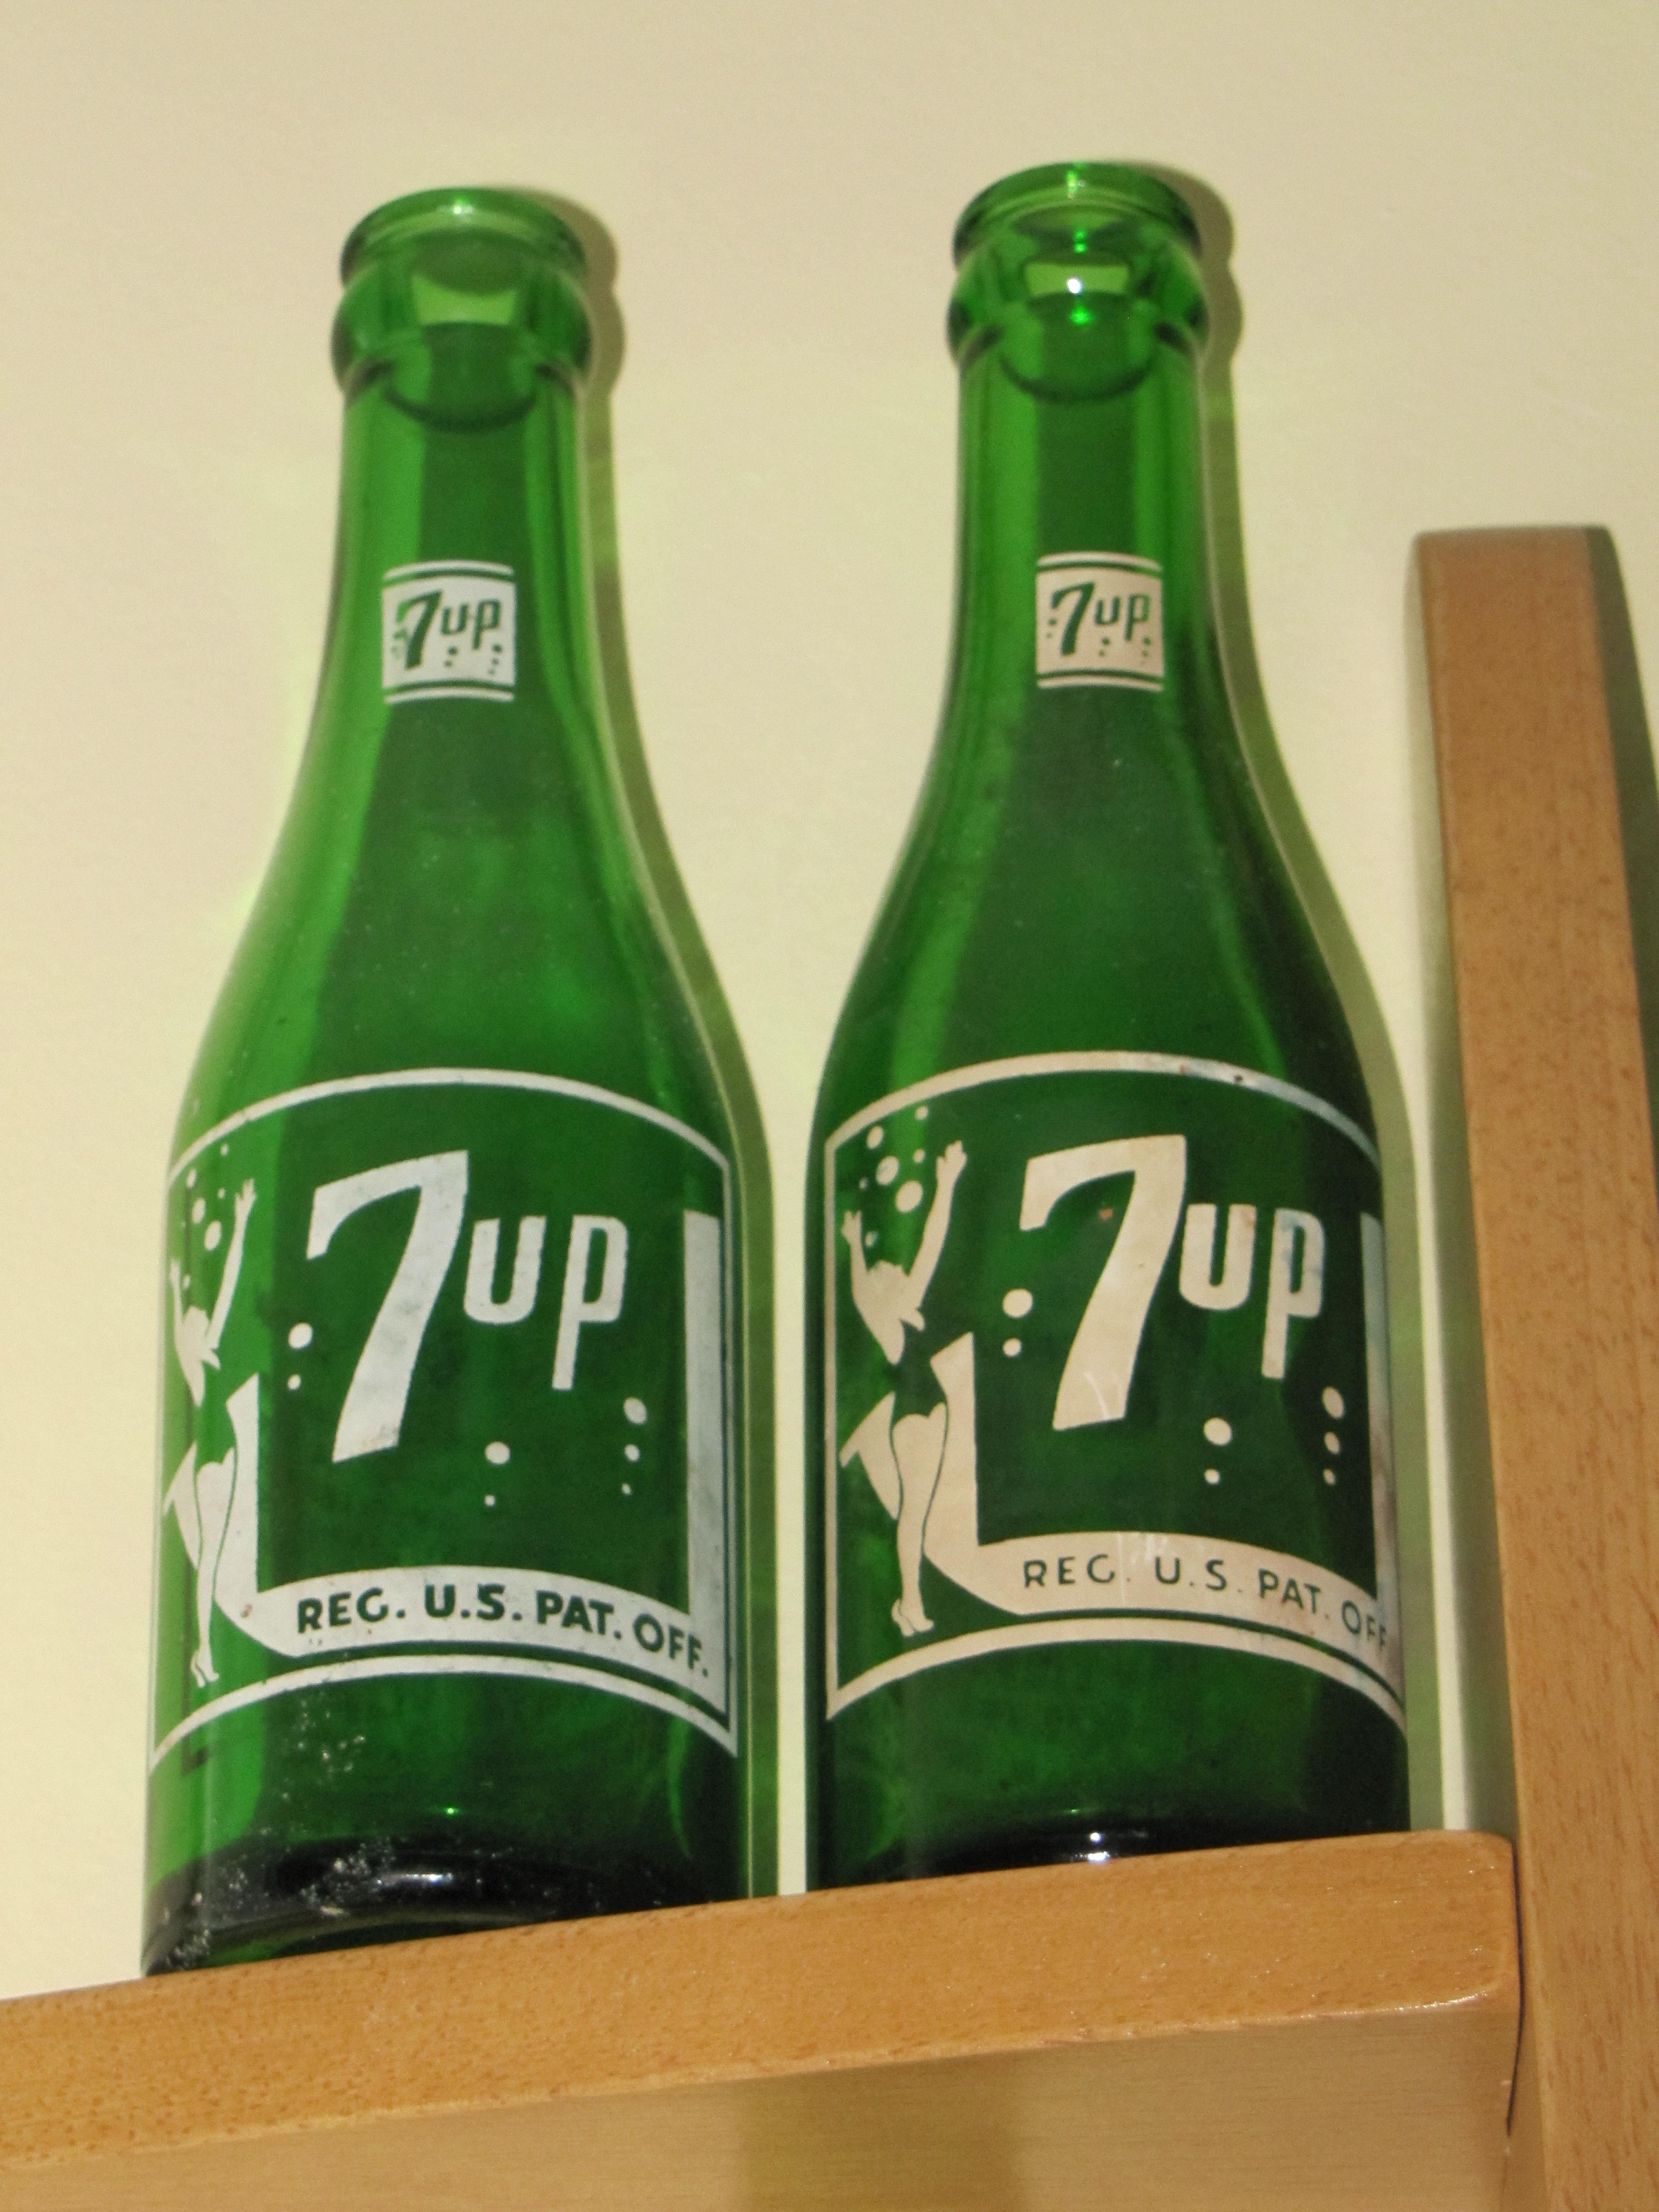 7up bottle dating